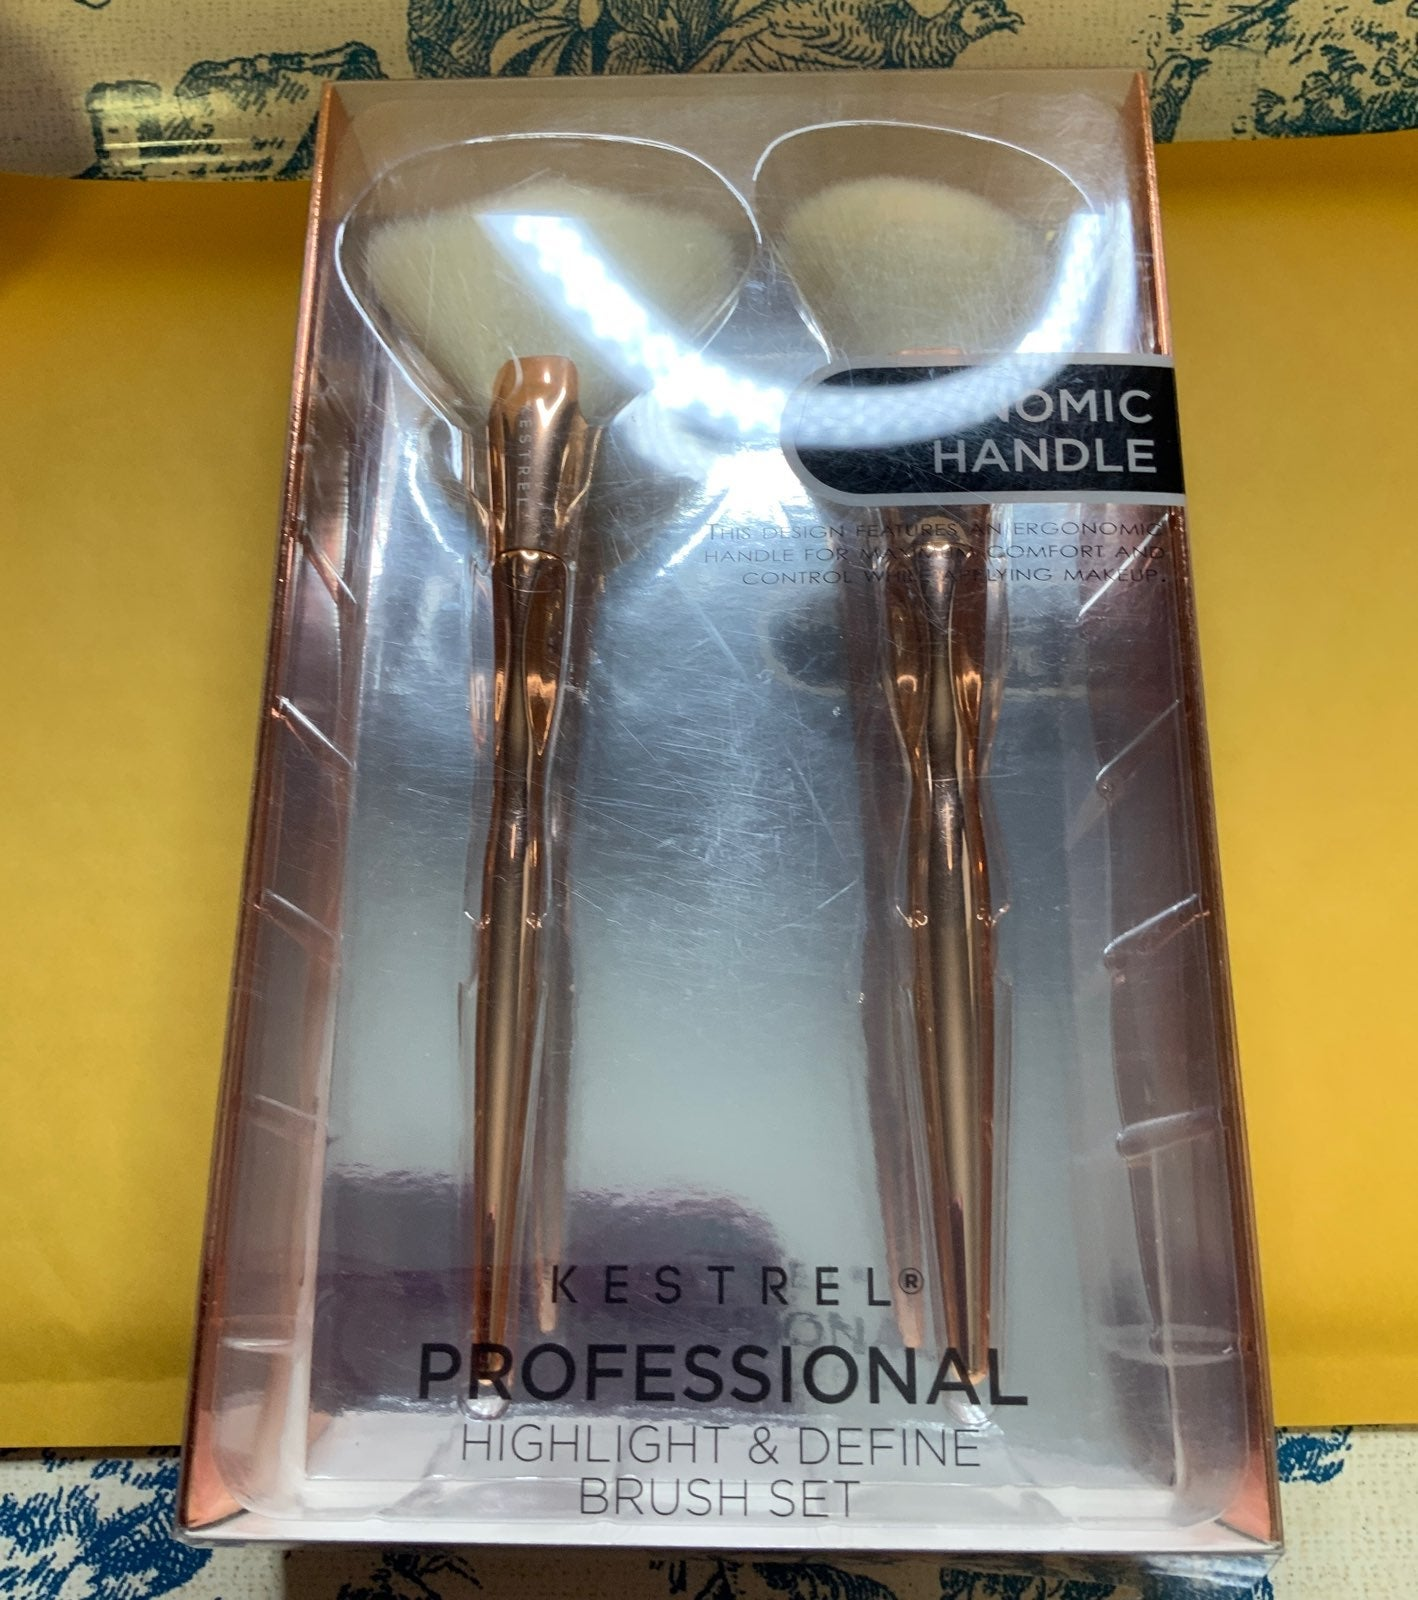 A set of brushes make up brushes